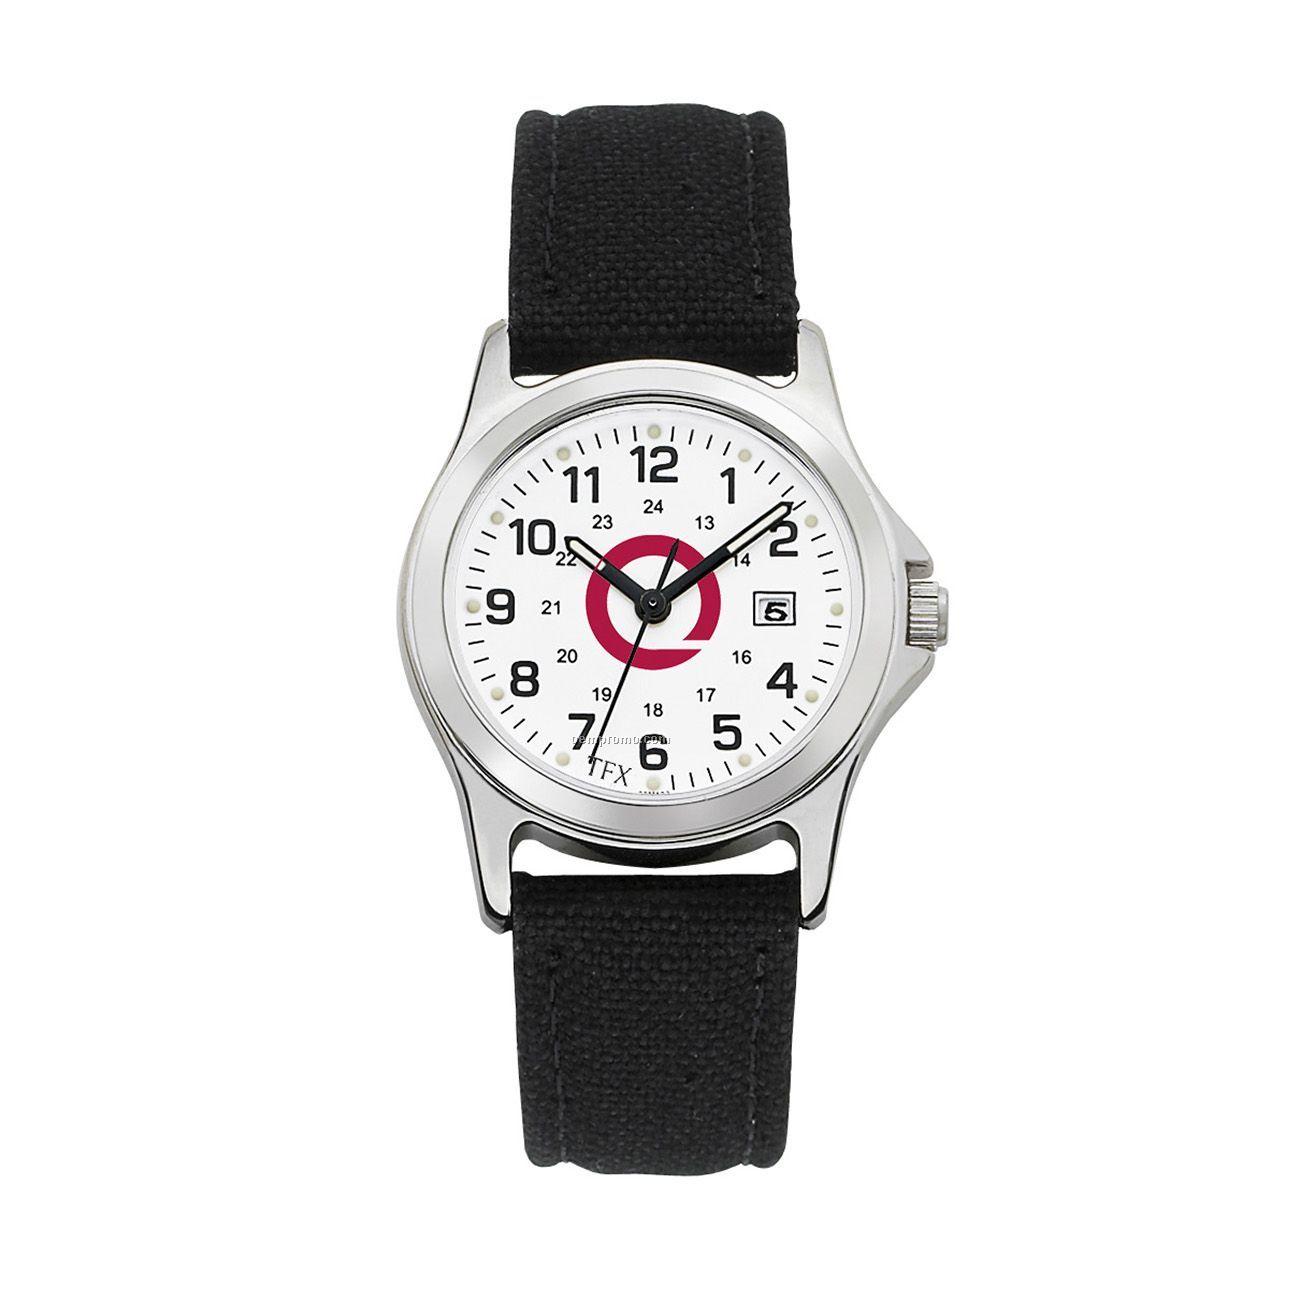 Tfx Distributed By Bulova- Ladies' Analog Wrist Watch